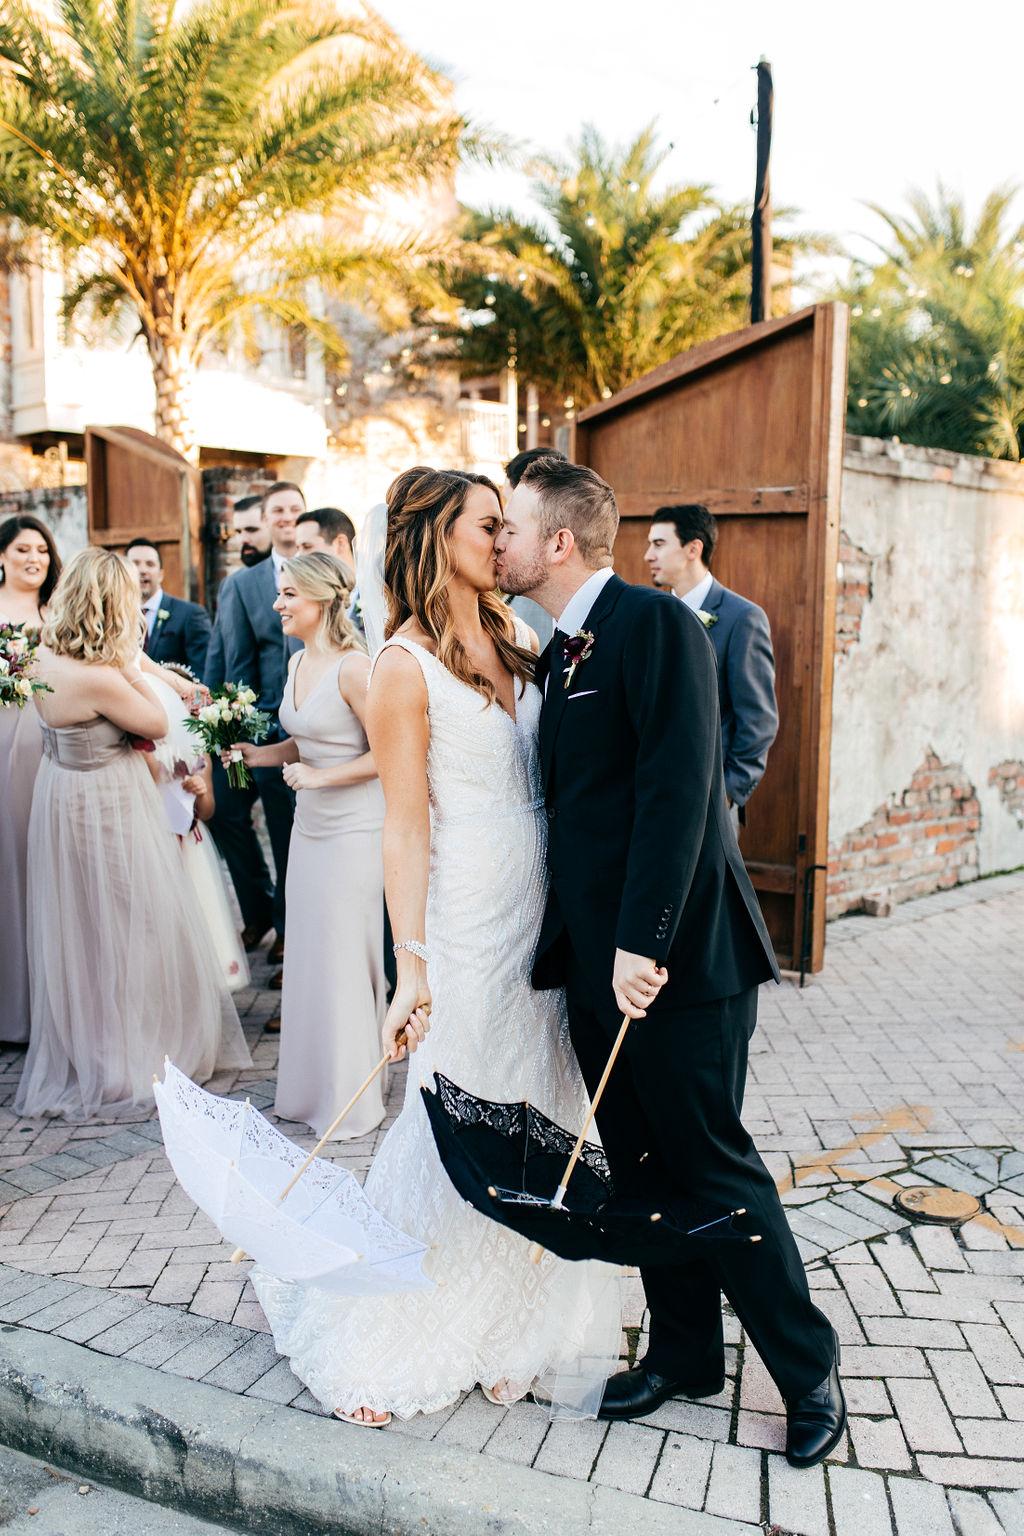 Race and Religious Weddings